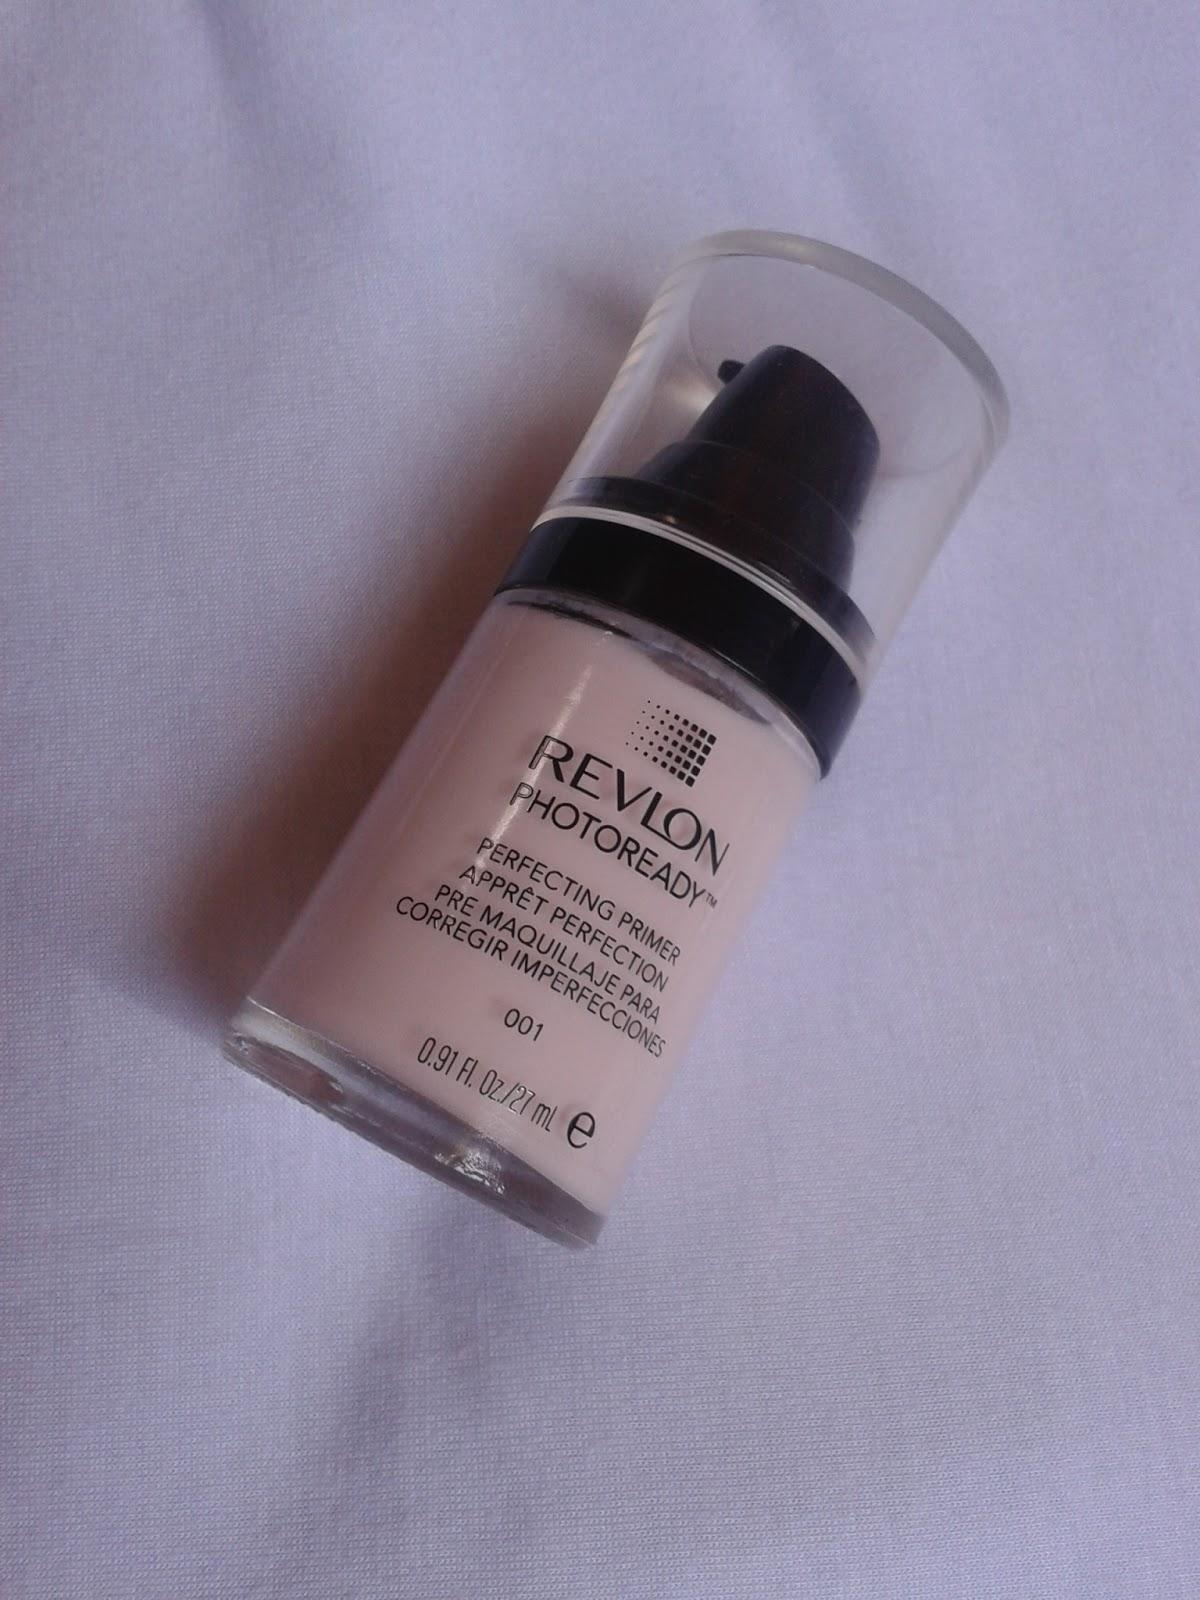 Revlon PhotoReady Concealer, Light Medium, 0.11 Oz Revlon photoready foundation 003